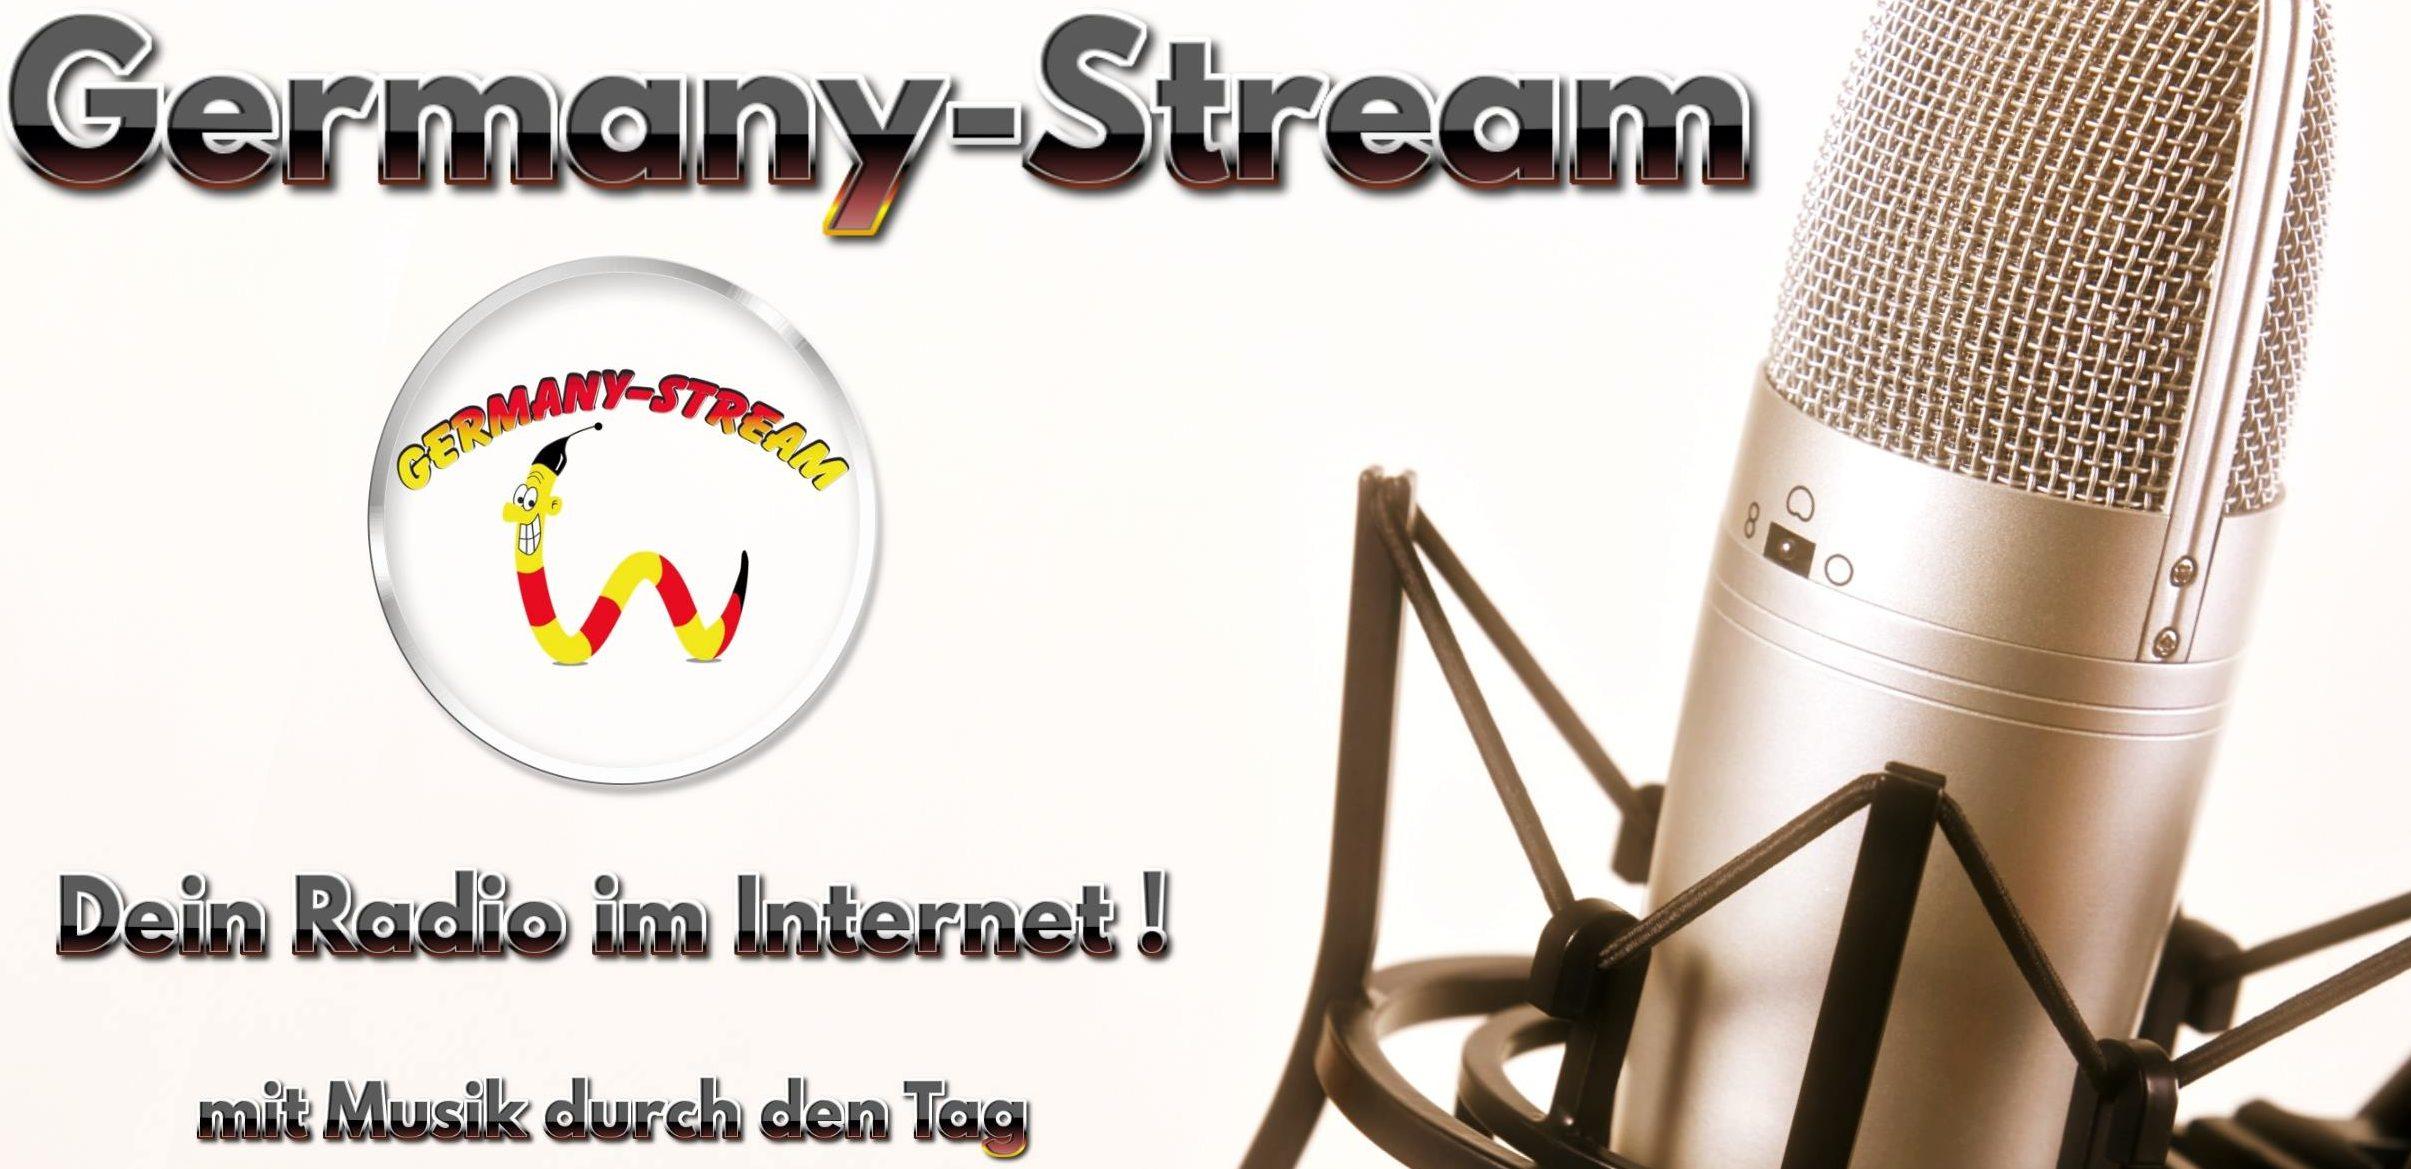 The Call Stream German